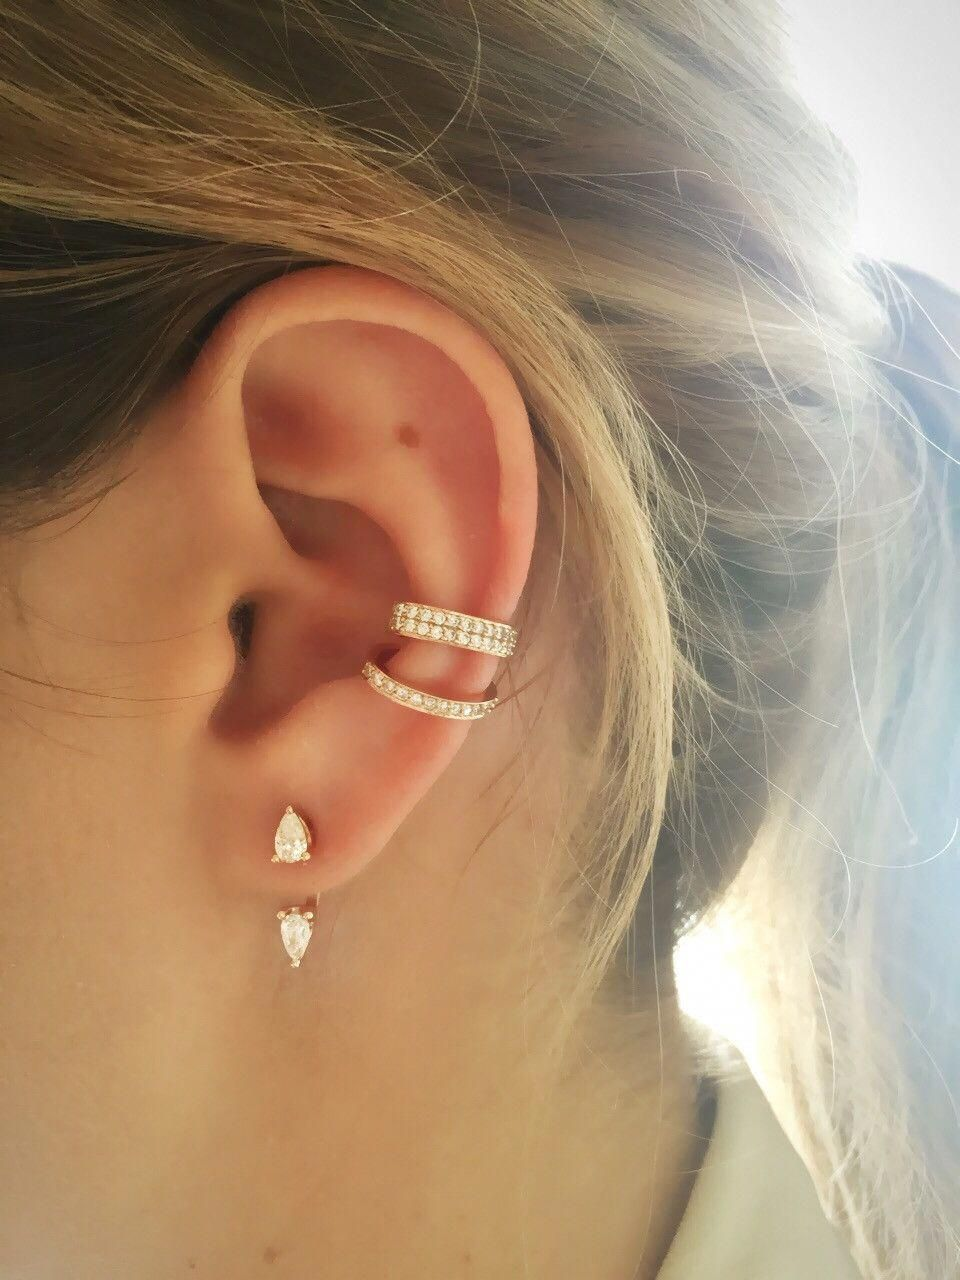 Different piercing ideas  Anita Ko Pear Orbit Earring u  Diamond Earrings  Pinteu